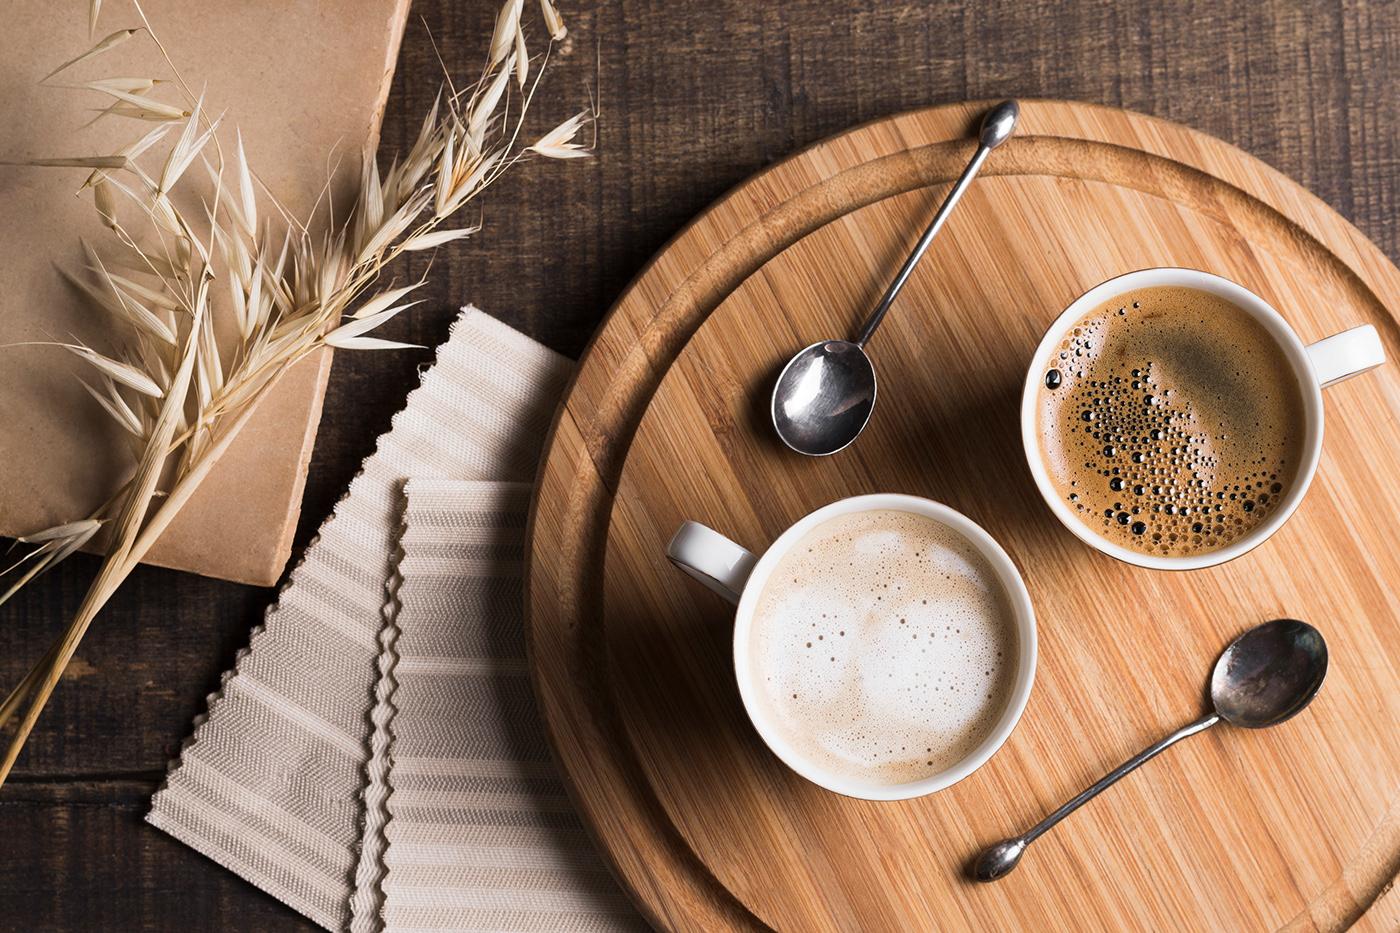 Package Design Coffee Bean咖啡豆包裝設計 on Behance